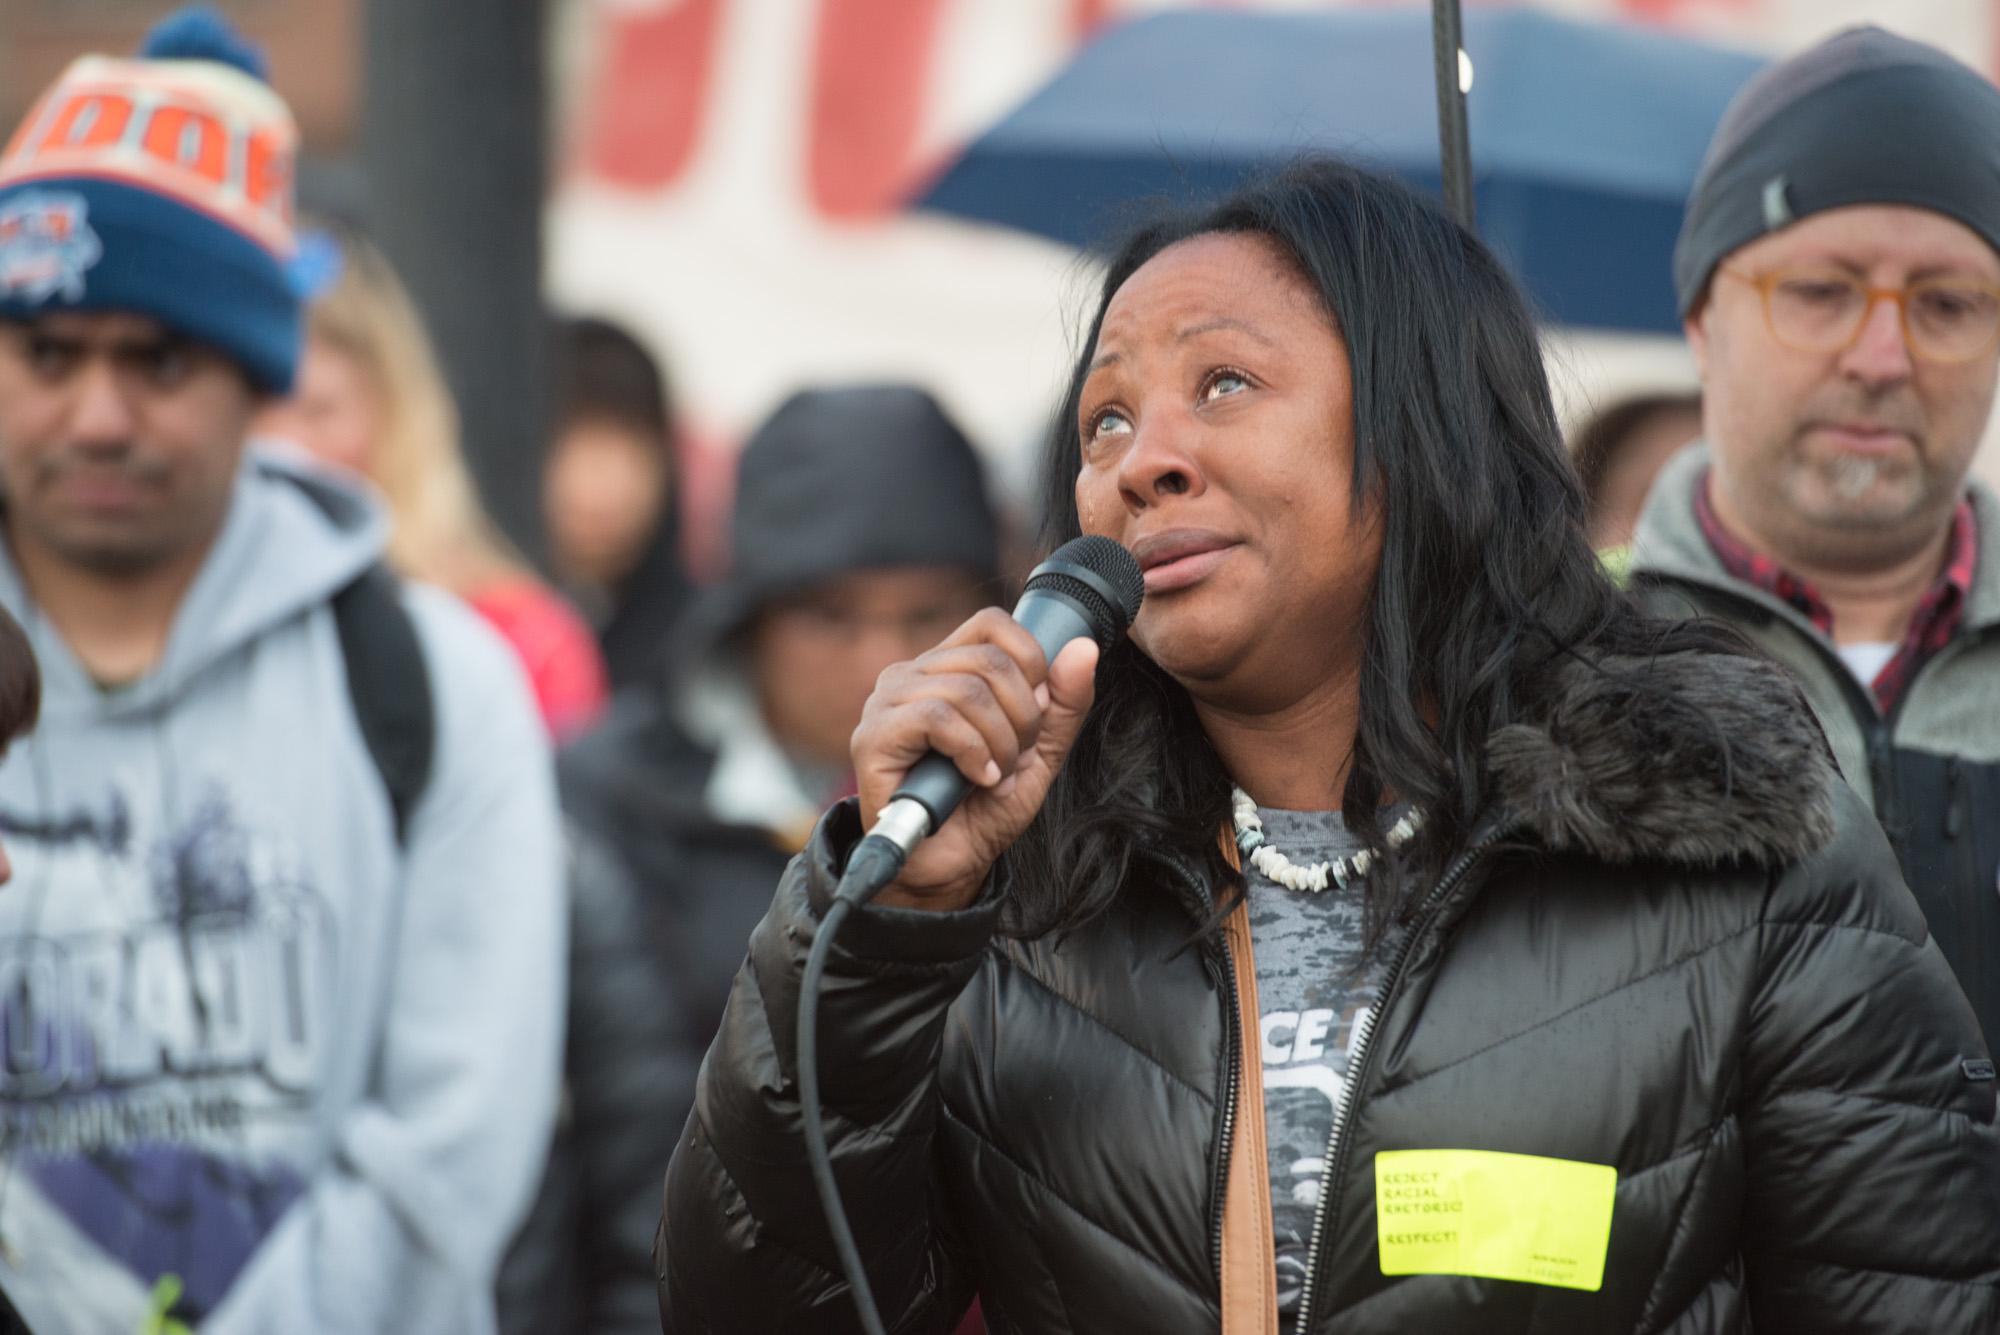 Charmaine Lawson The Mother Of Slain Hsu Student Gathers